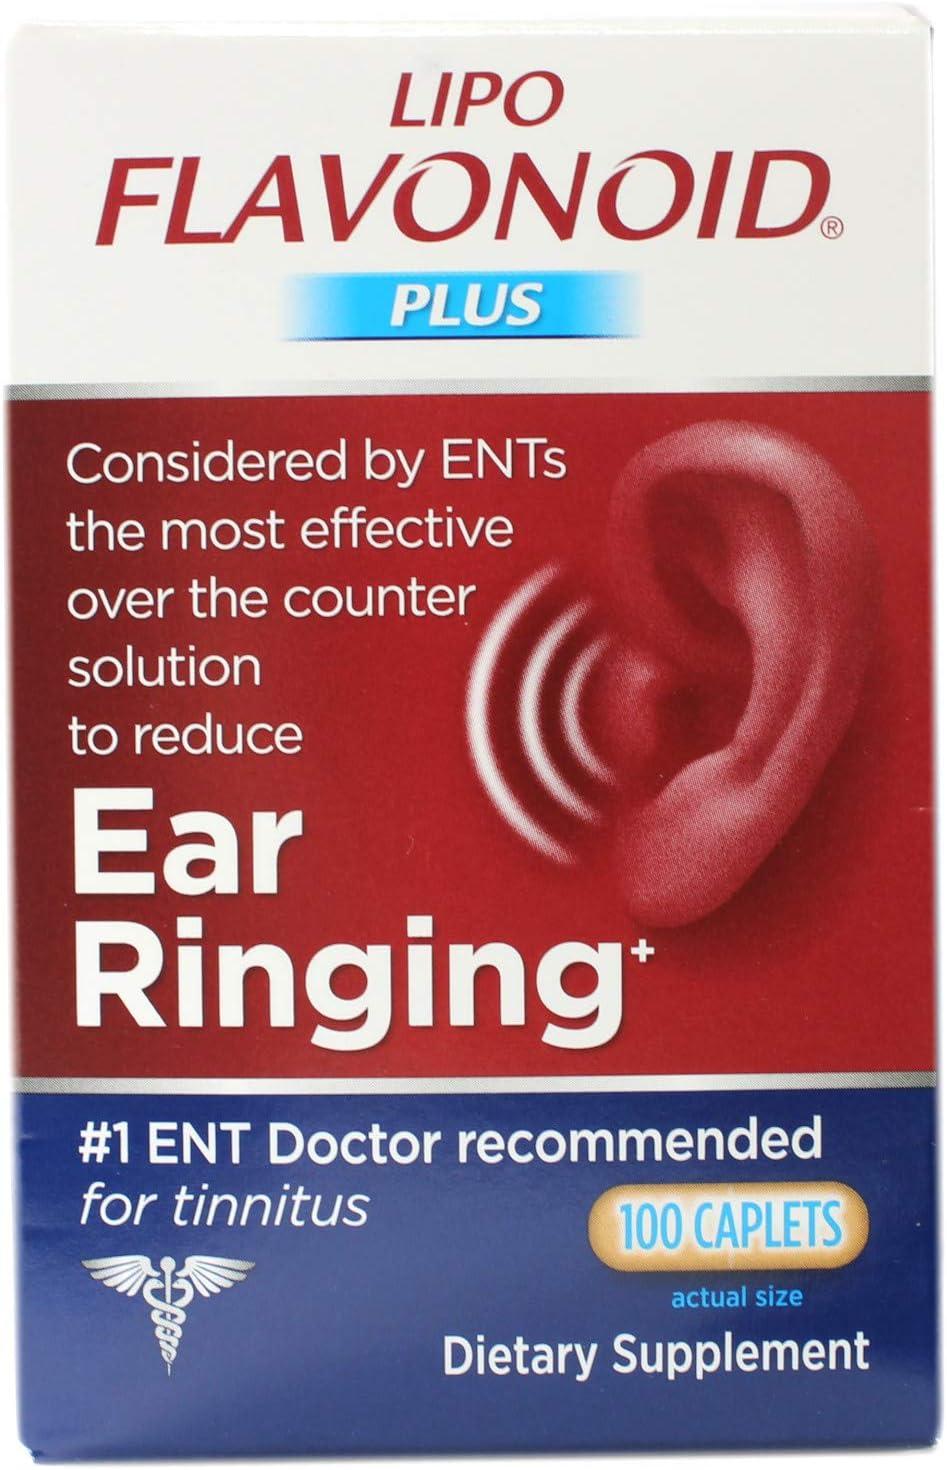 DSE Healthcare Solutions - LipoFlavonoid Plus Extra Strength Unique Ear Health Formula - 100 Caplets: Health & Personal Care